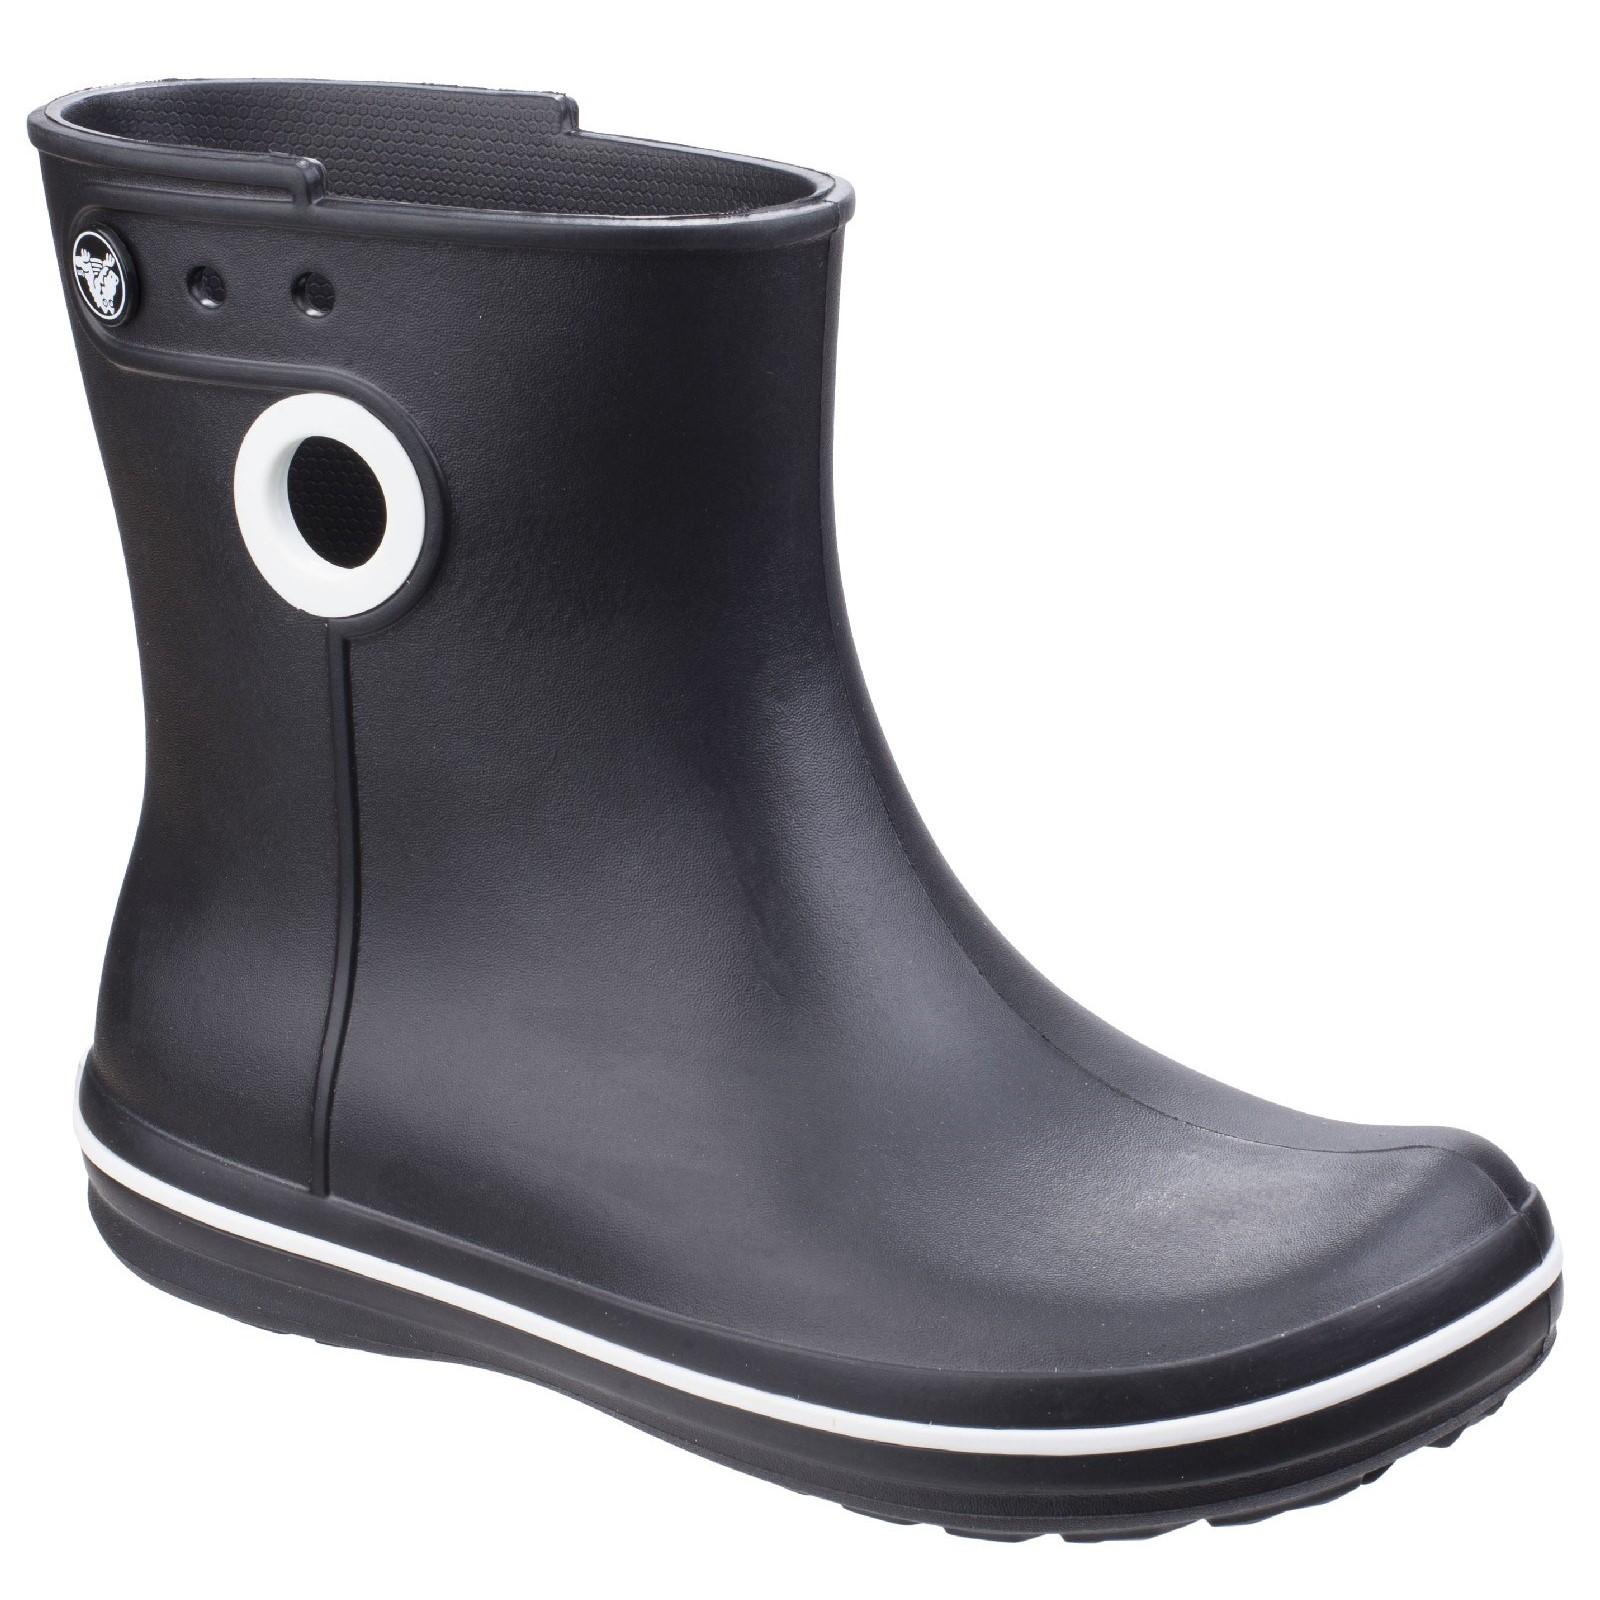 Crocs Womens Crocband Jaunt Shorty Womens Boot